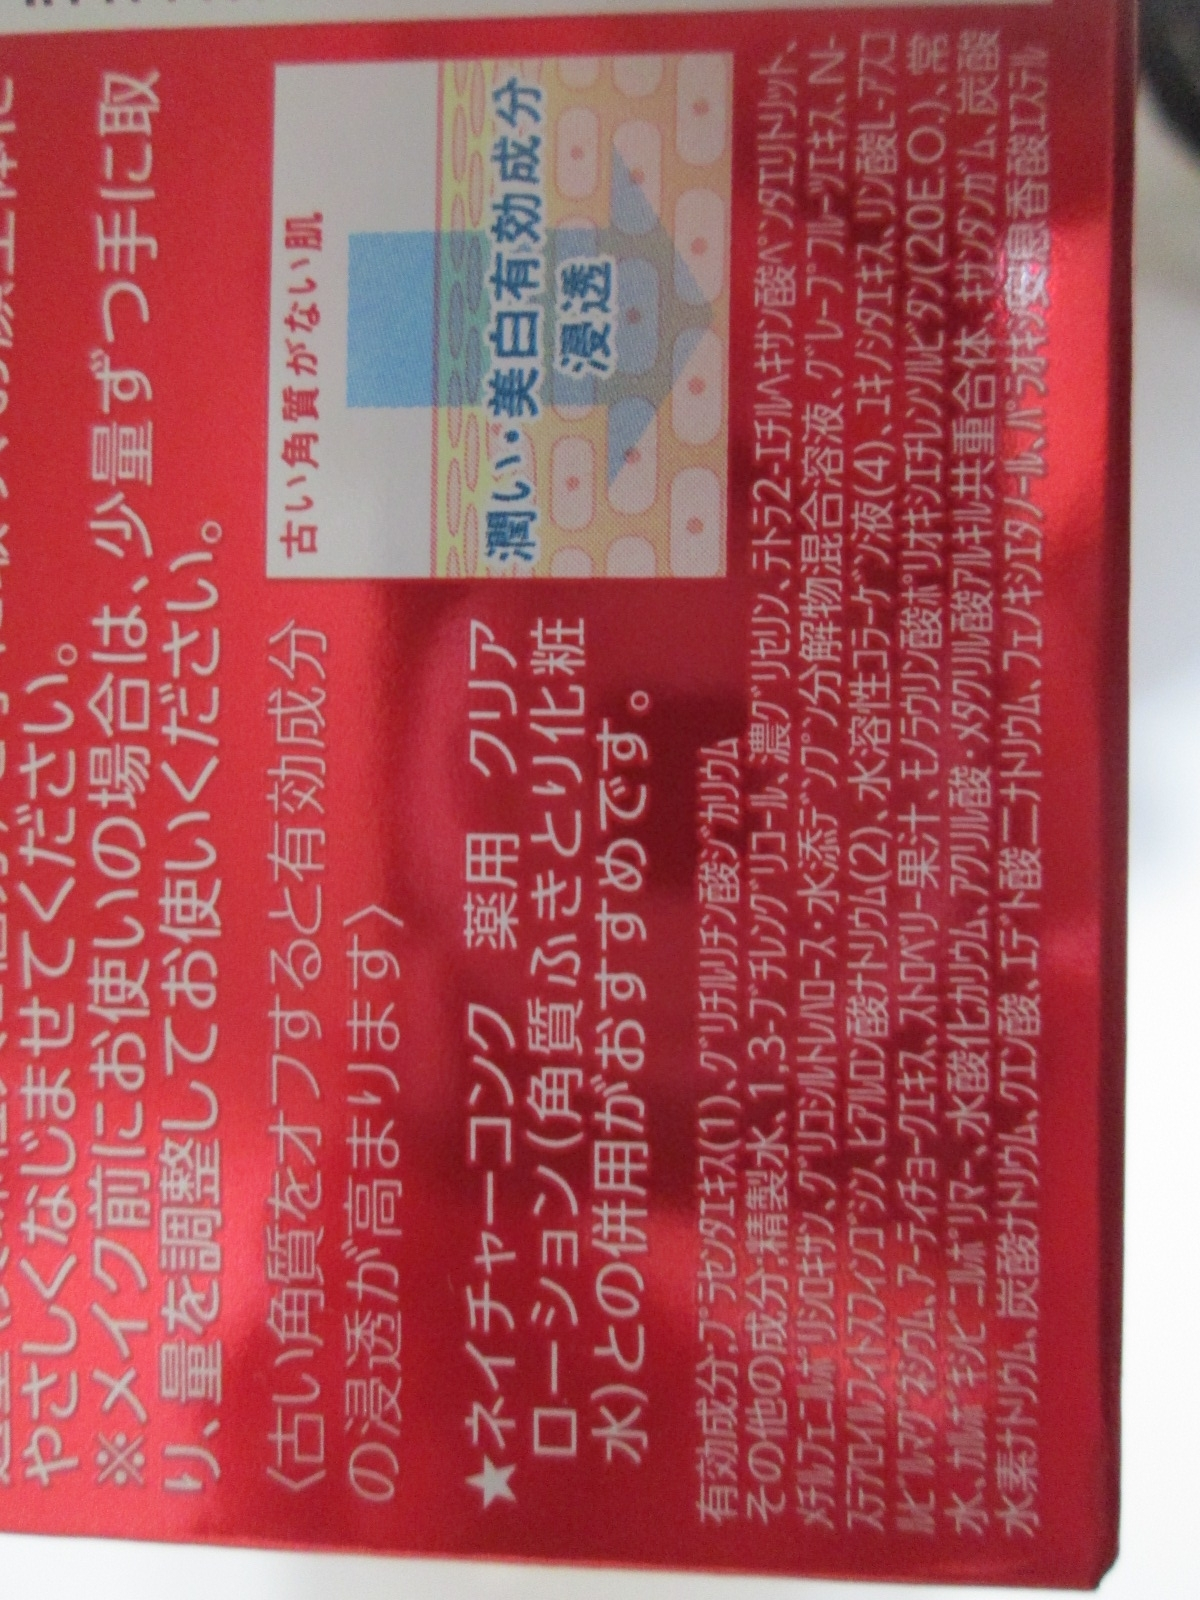 IMG_2290ネイチャ   (2)